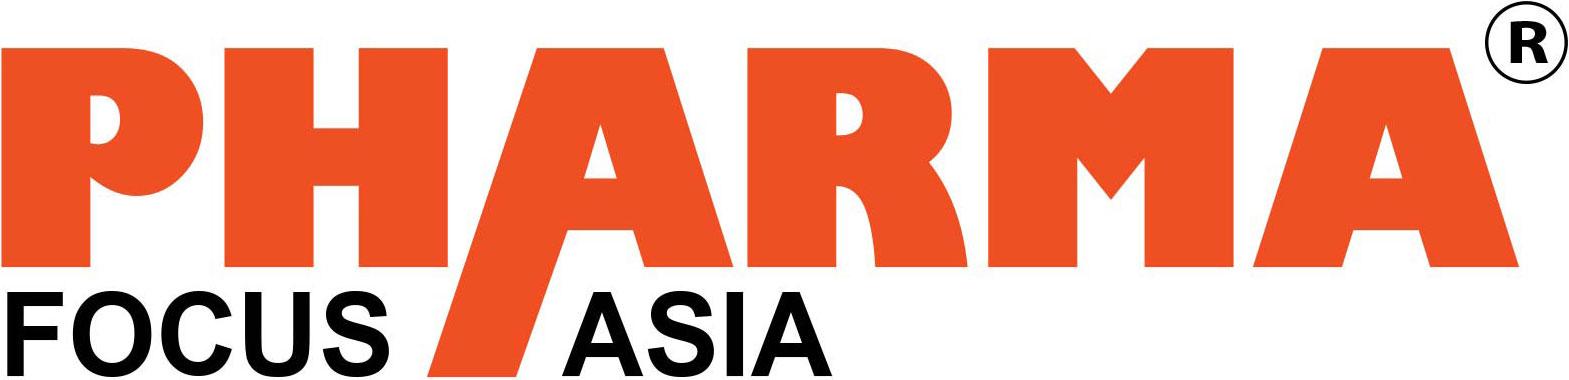 Pharma Focus Asia logo